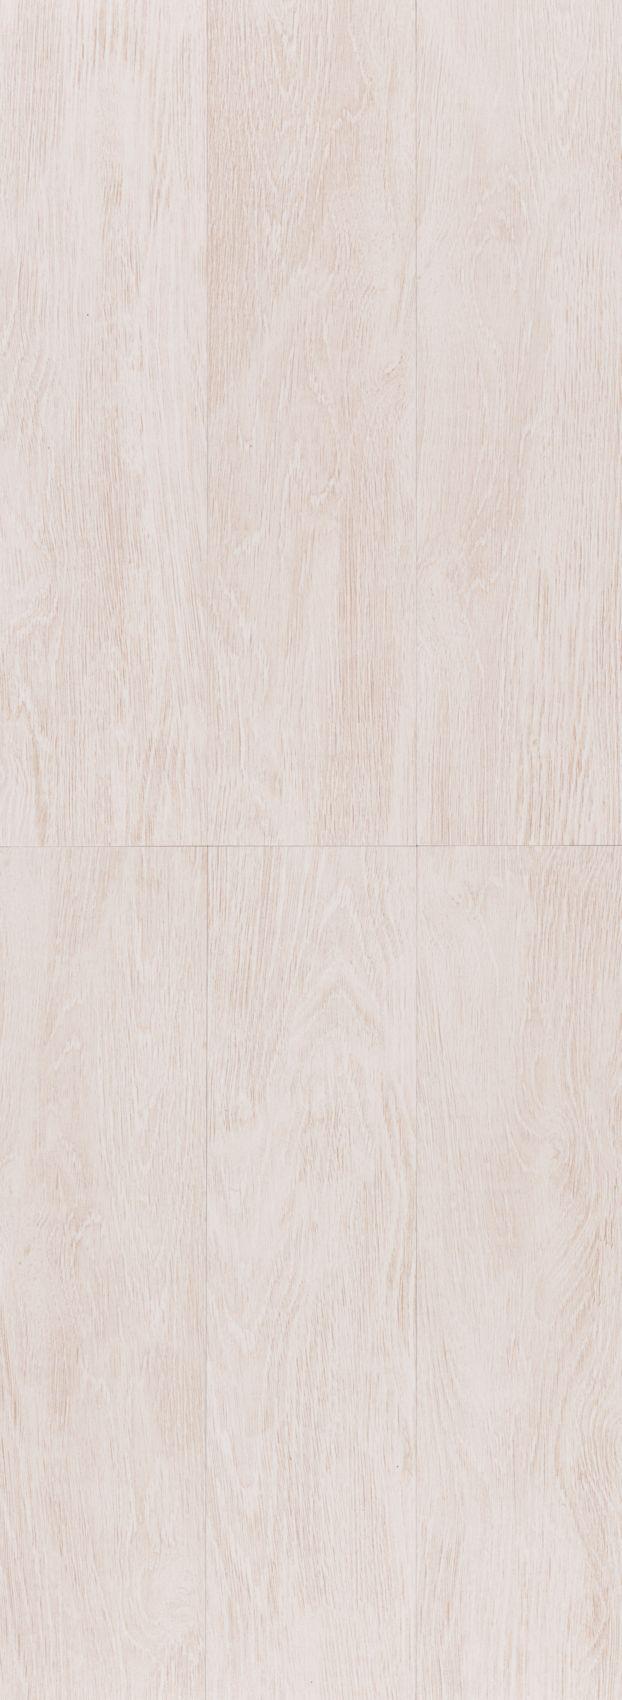 Treyburne Linen Oak